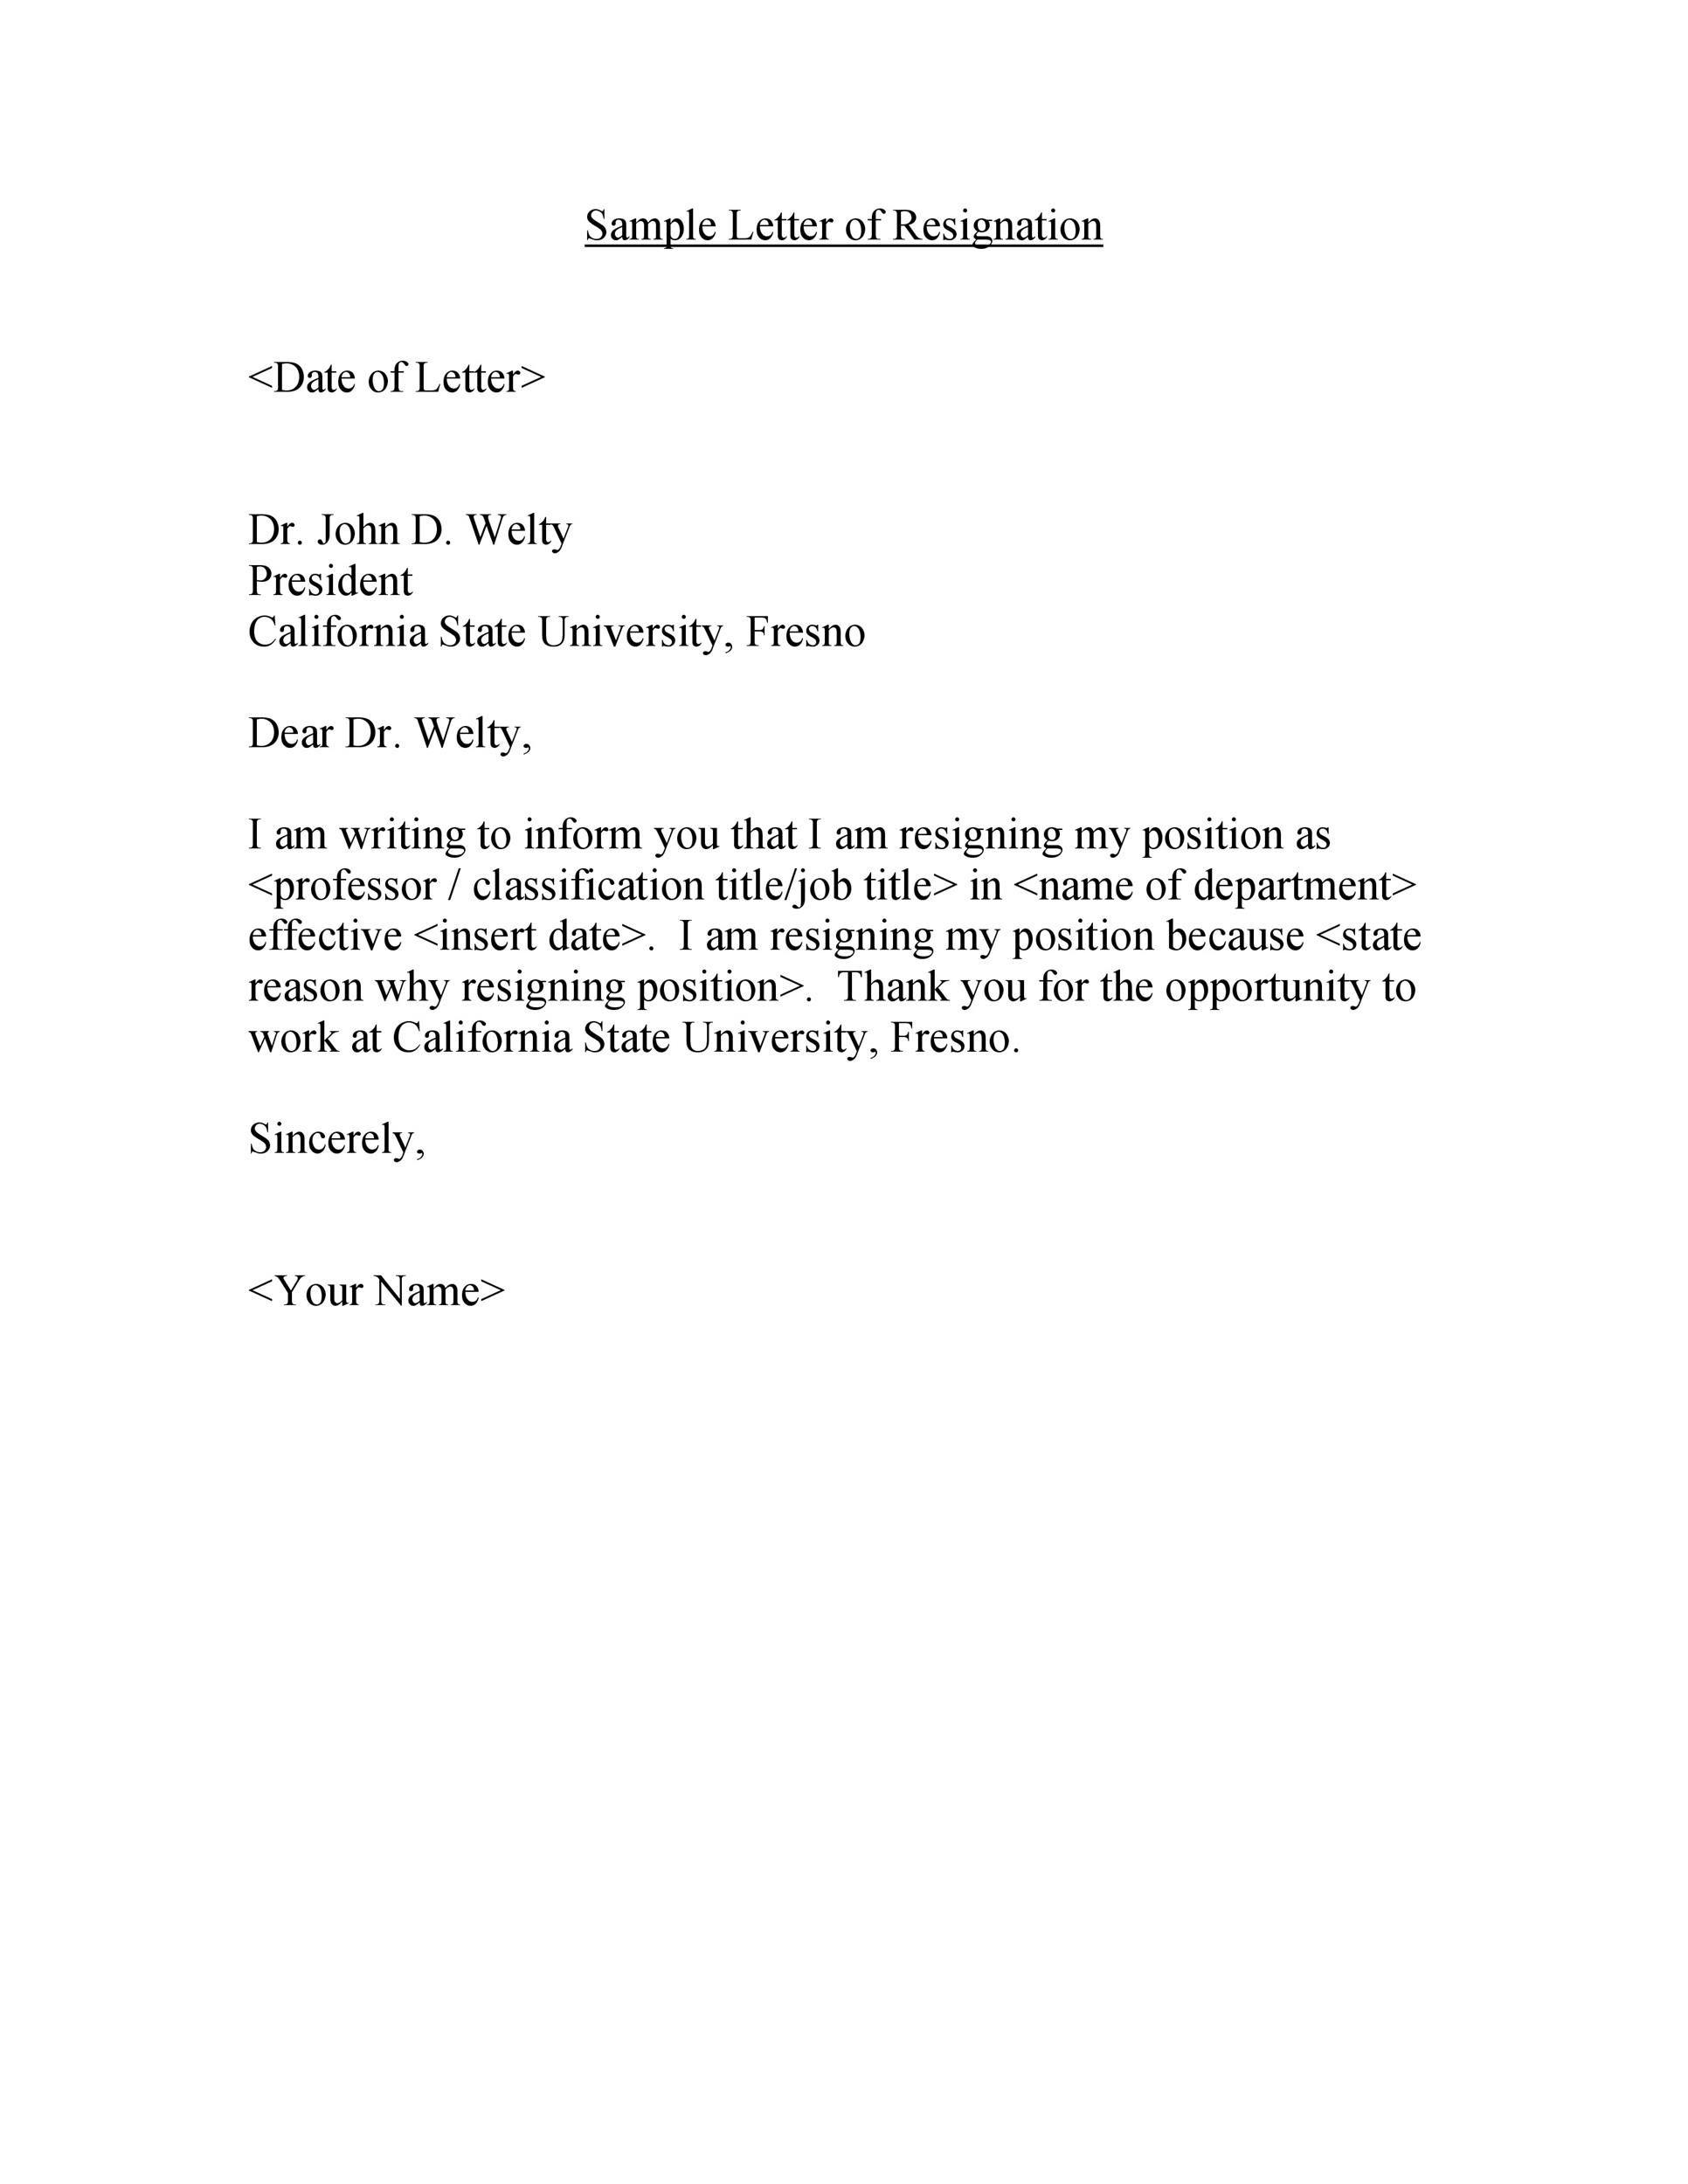 008 Sensational Sample Resignation Letter Template Inspiration  For Teacher Word - Free DownloadableFull